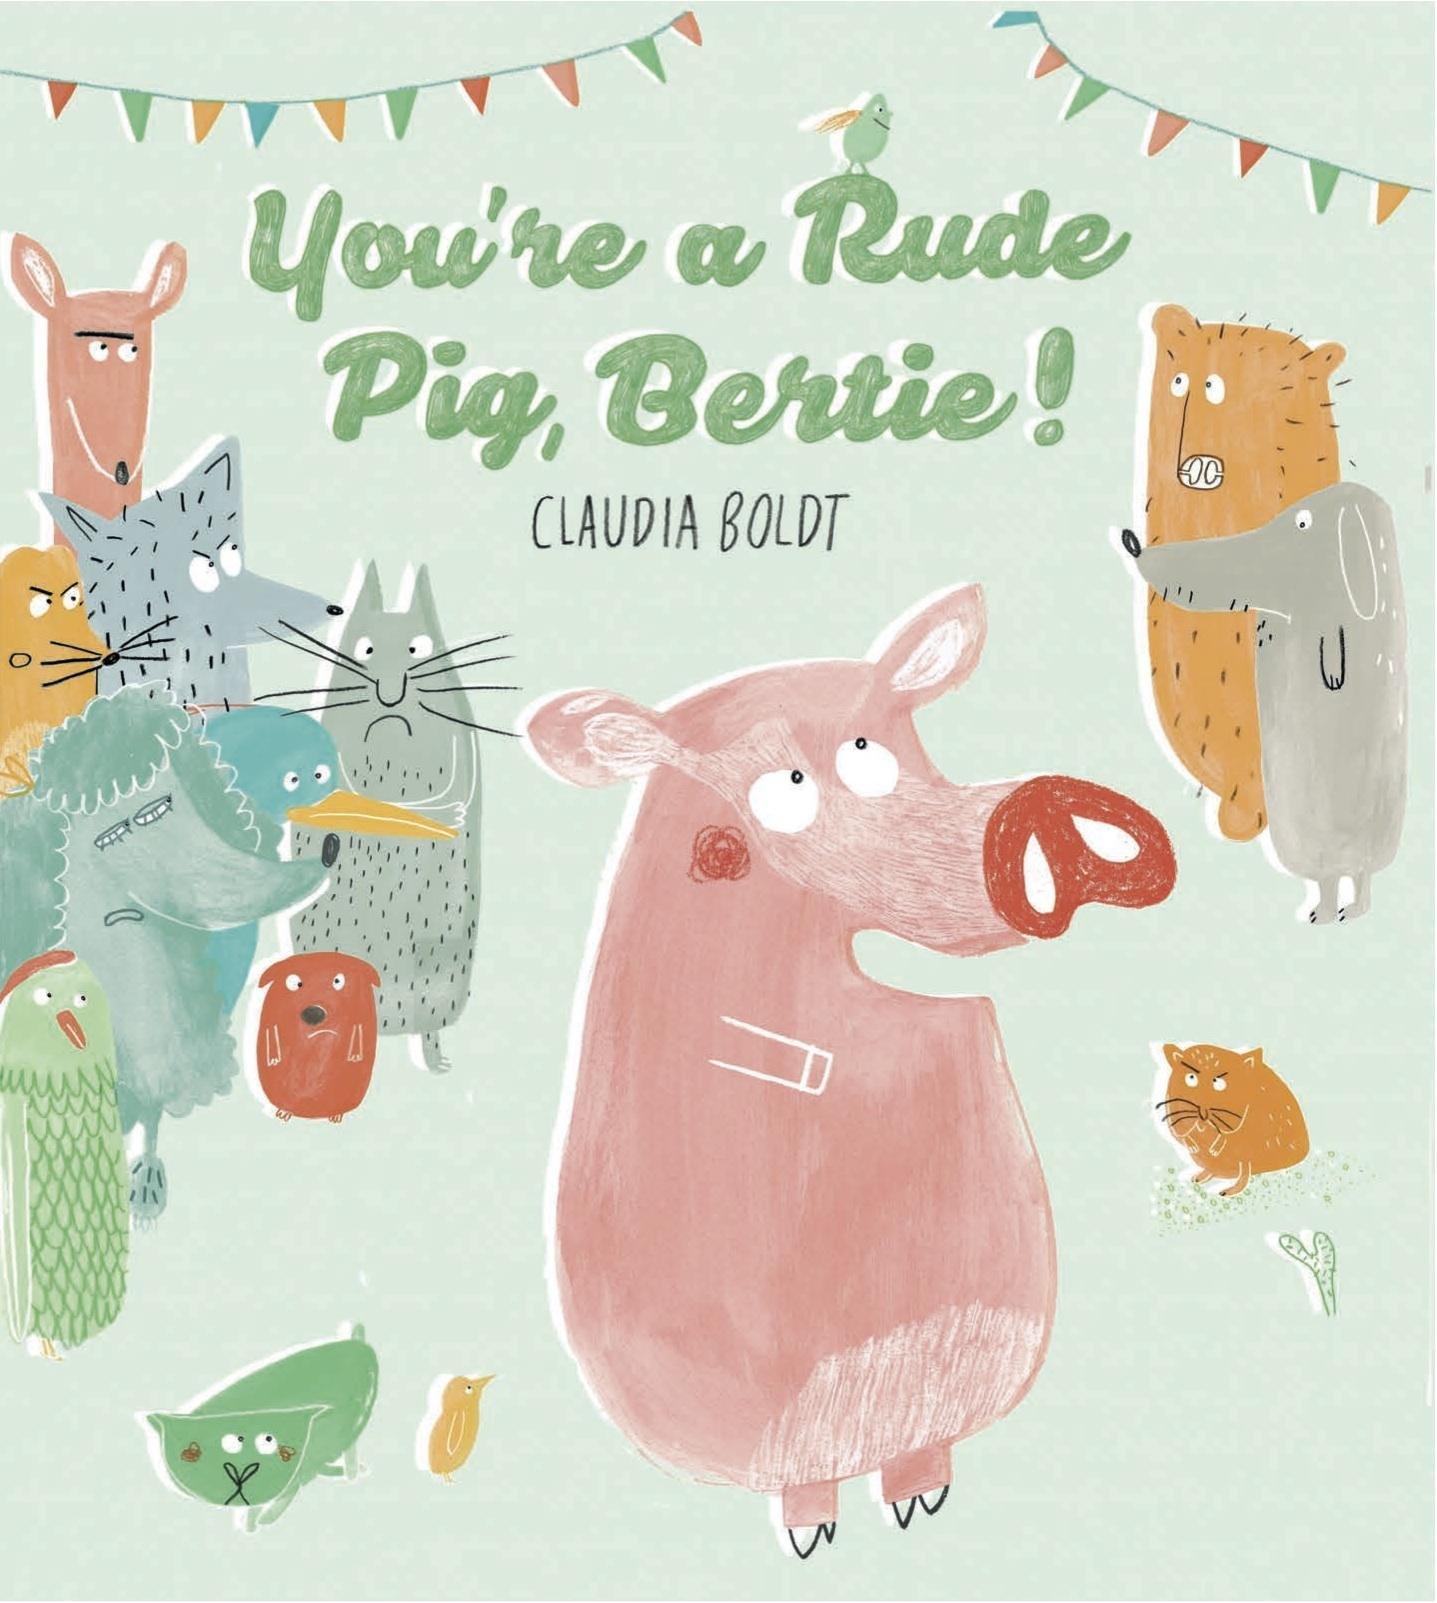 You're a Rude Pig, Bertie PDF ePub fb2 ebook